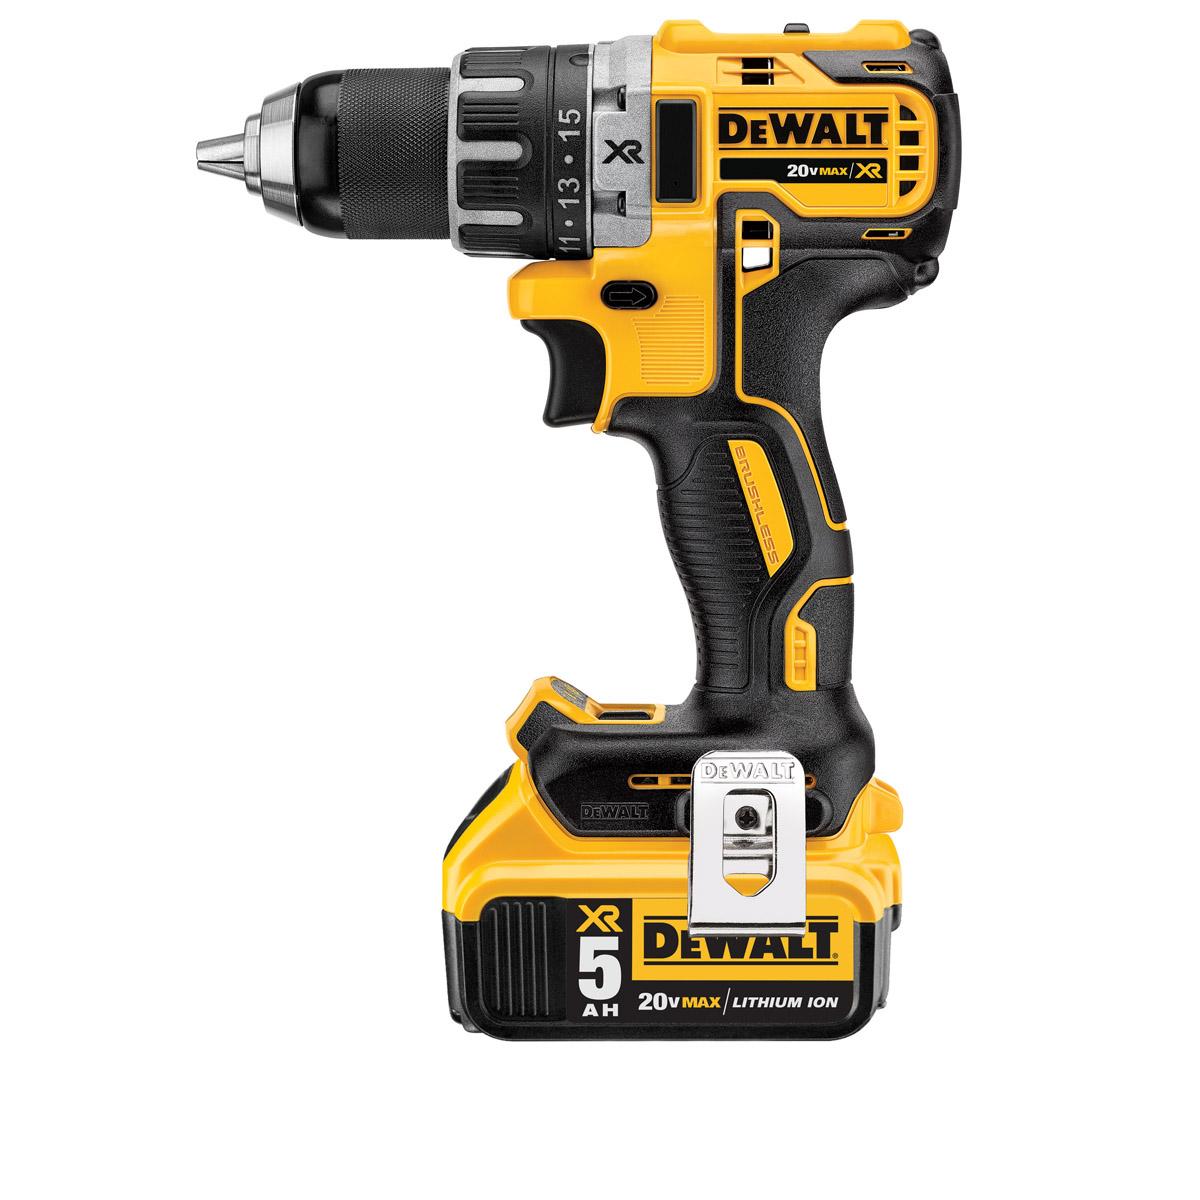 DeWALT DCD791P2-GB - 18V XR Li-Ion Brushless 13mm Compact Hammer Drill Driver 5.0Ah